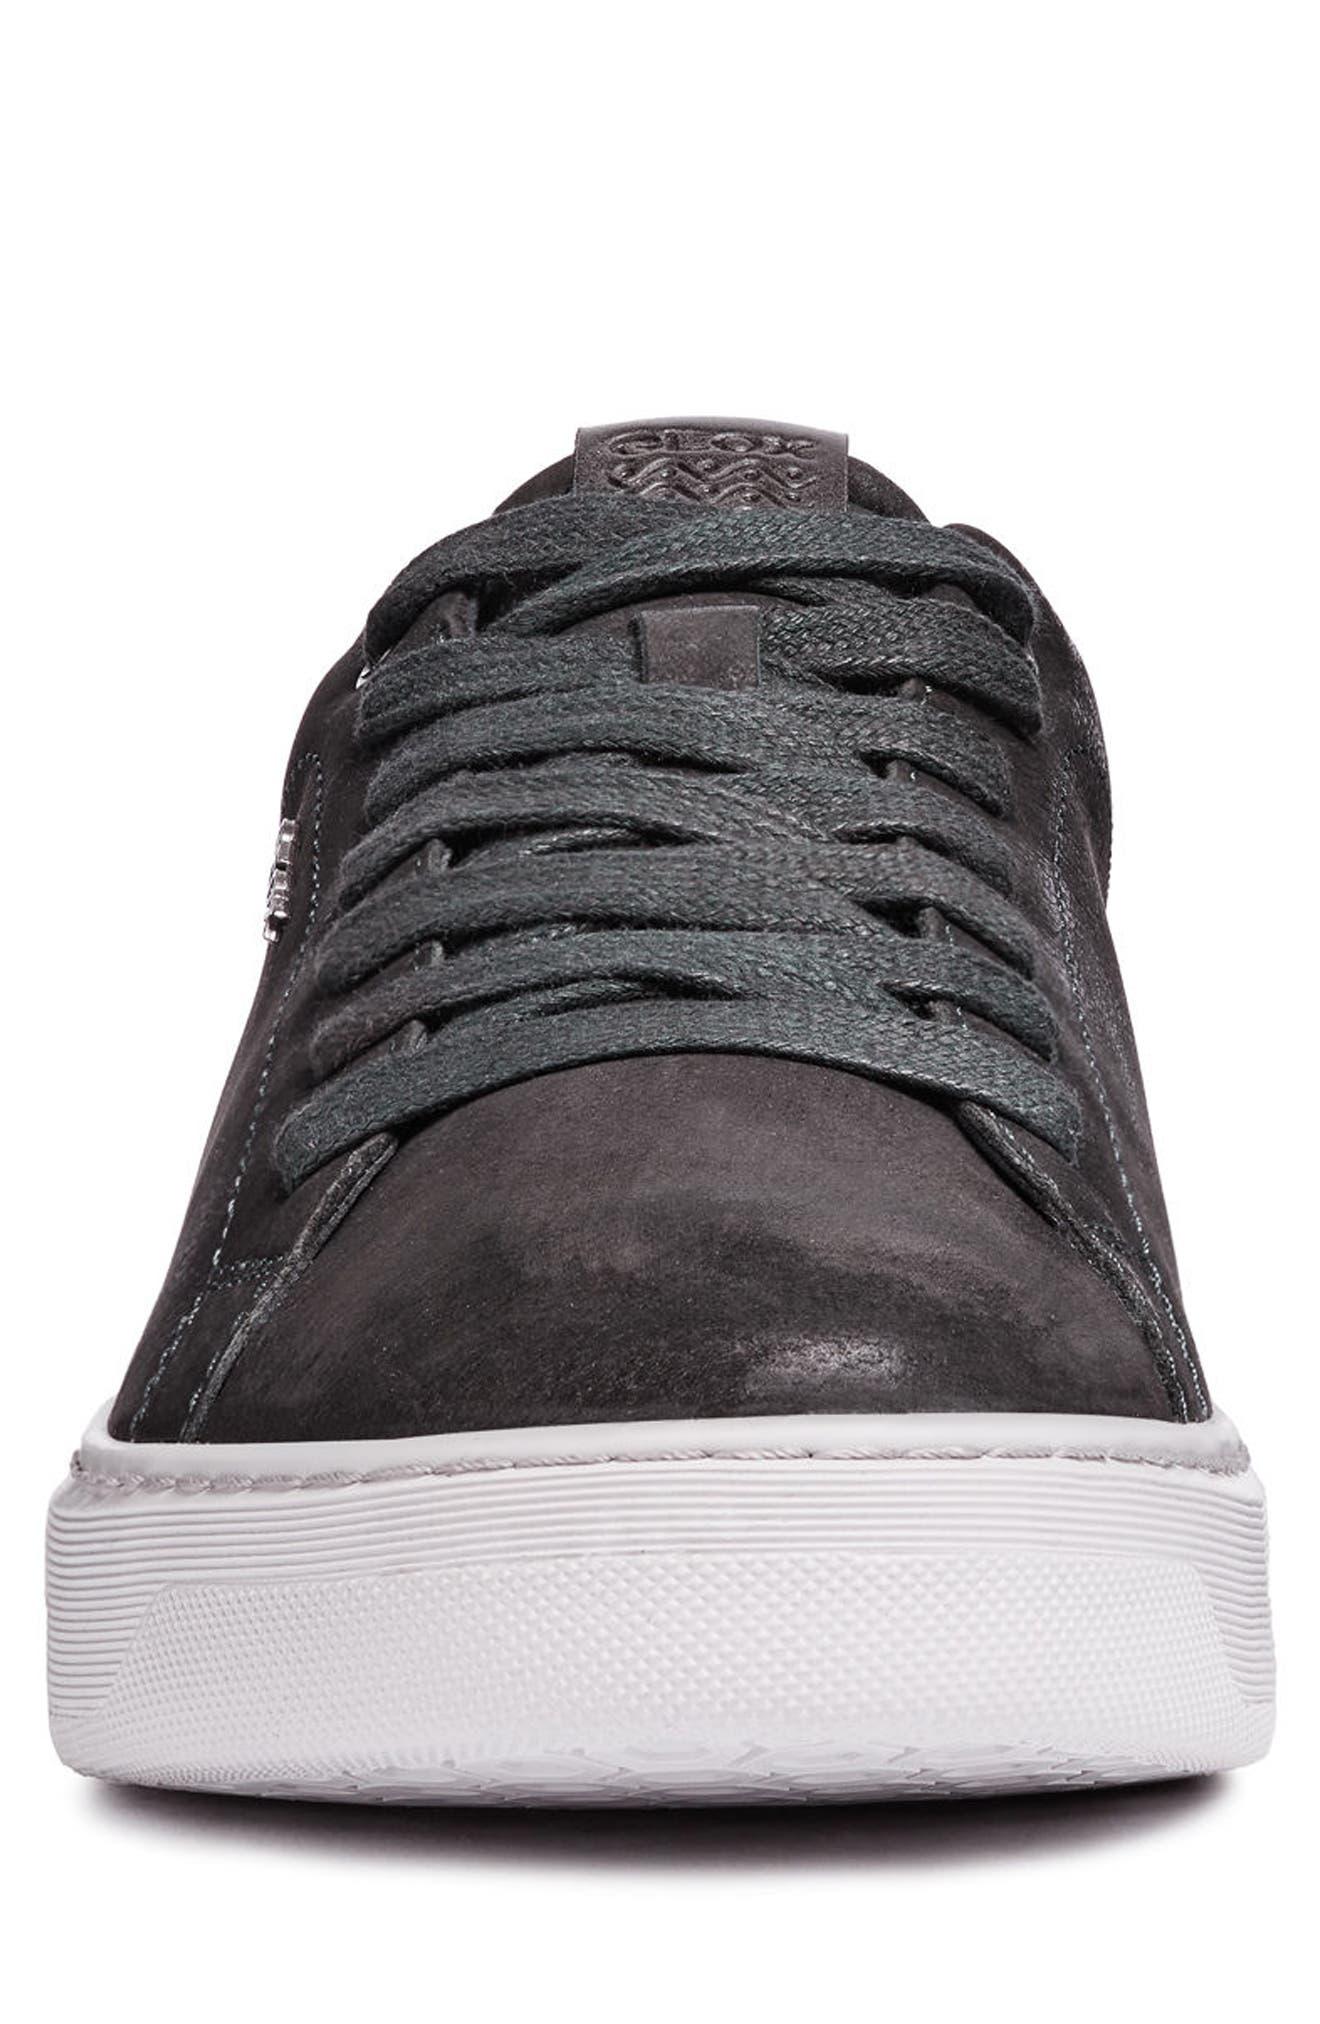 Deiven 5 Low Top Sneaker,                             Alternate thumbnail 4, color,                             DARK JEANS LEATHER